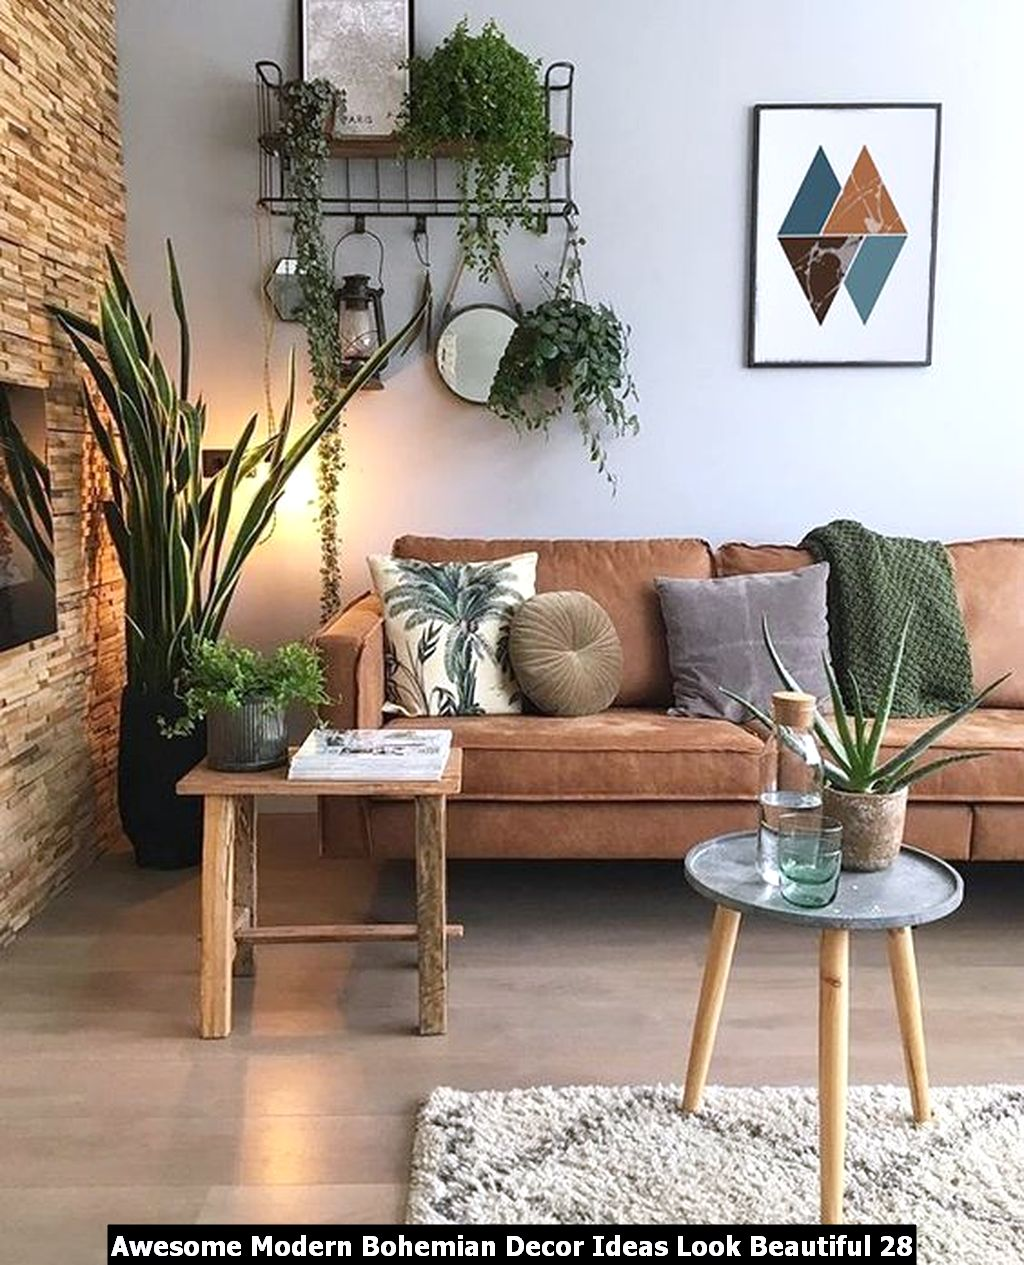 Awesome Modern Bohemian Decor Ideas Look Beautiful 28